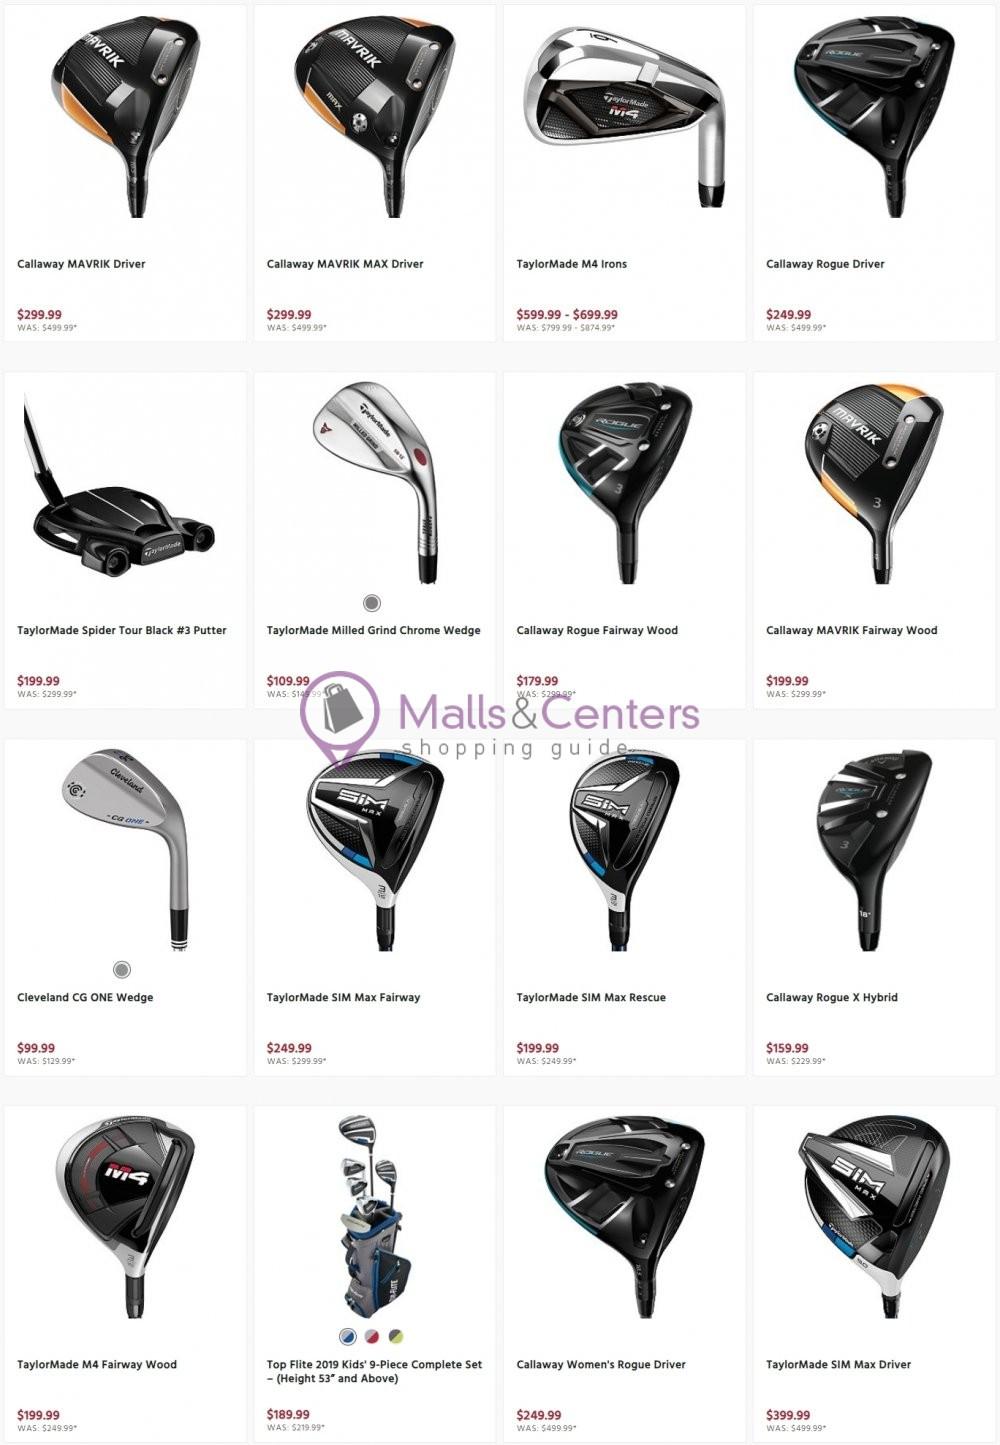 weekly ads Golf Galaxy - page 1 - mallscenters.com